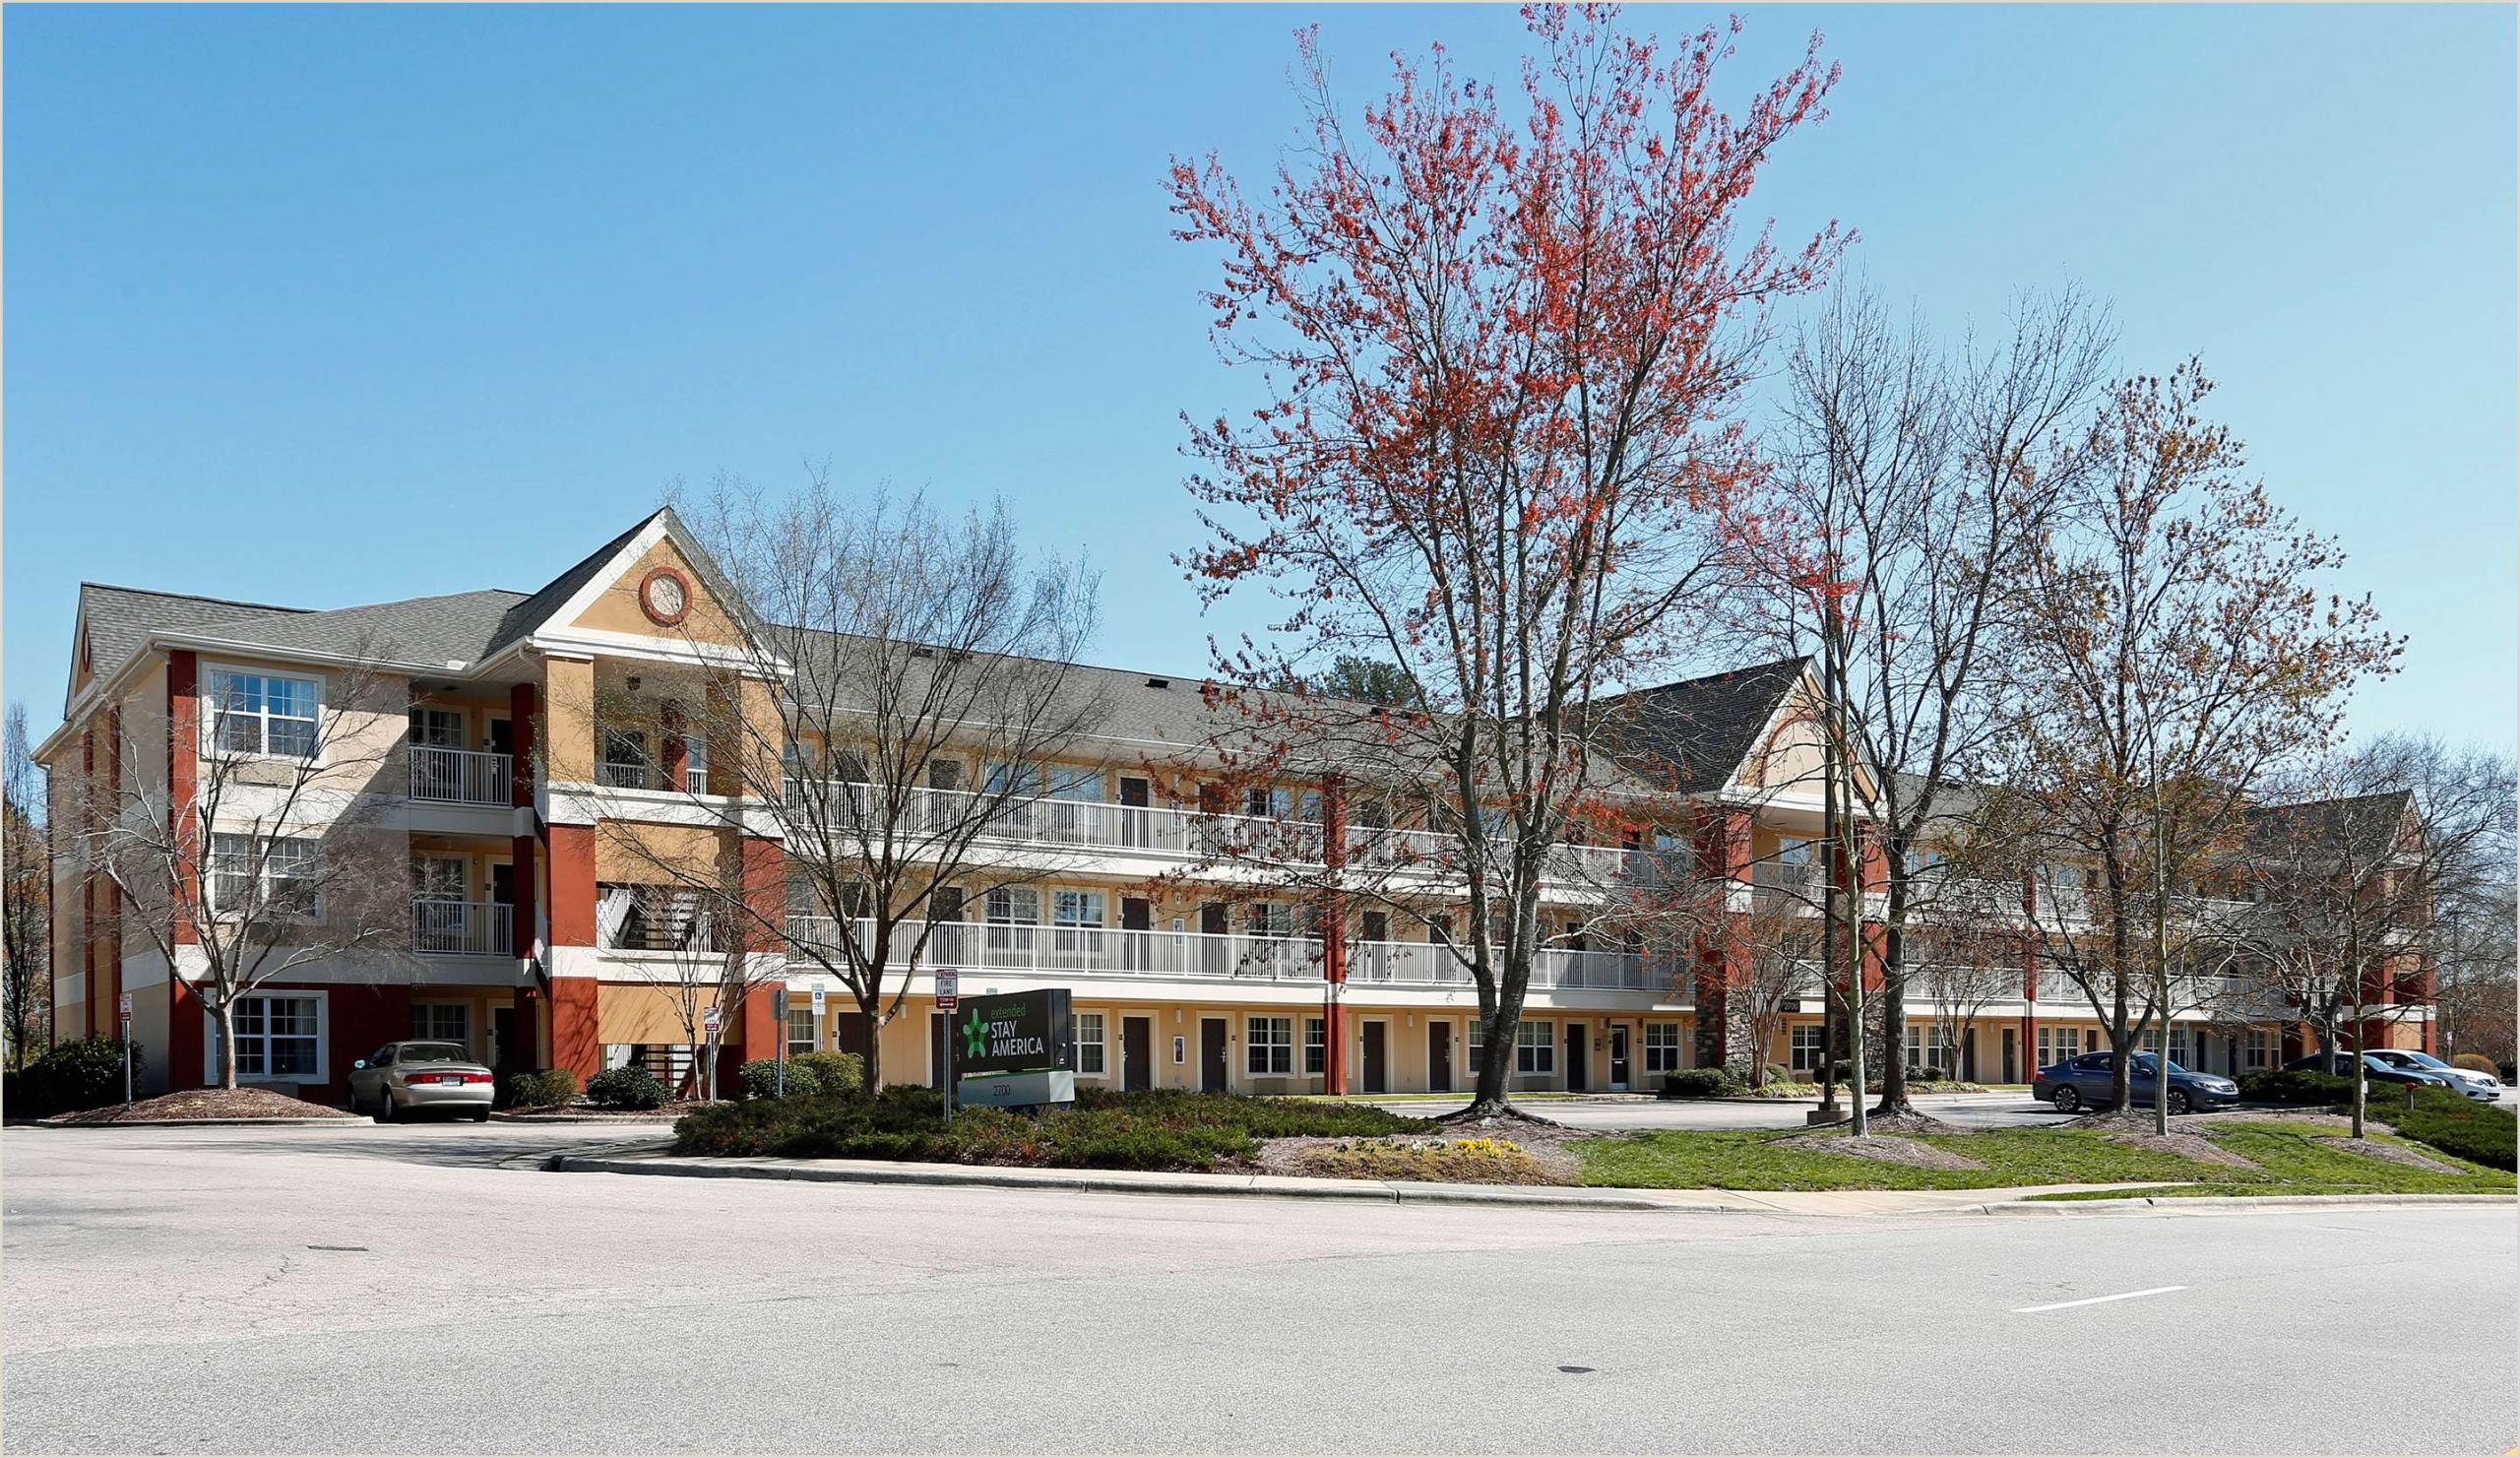 Best Business Cards Raleigh La Quinta Inn & Suites By Wyndham Raleigh Durham Airport